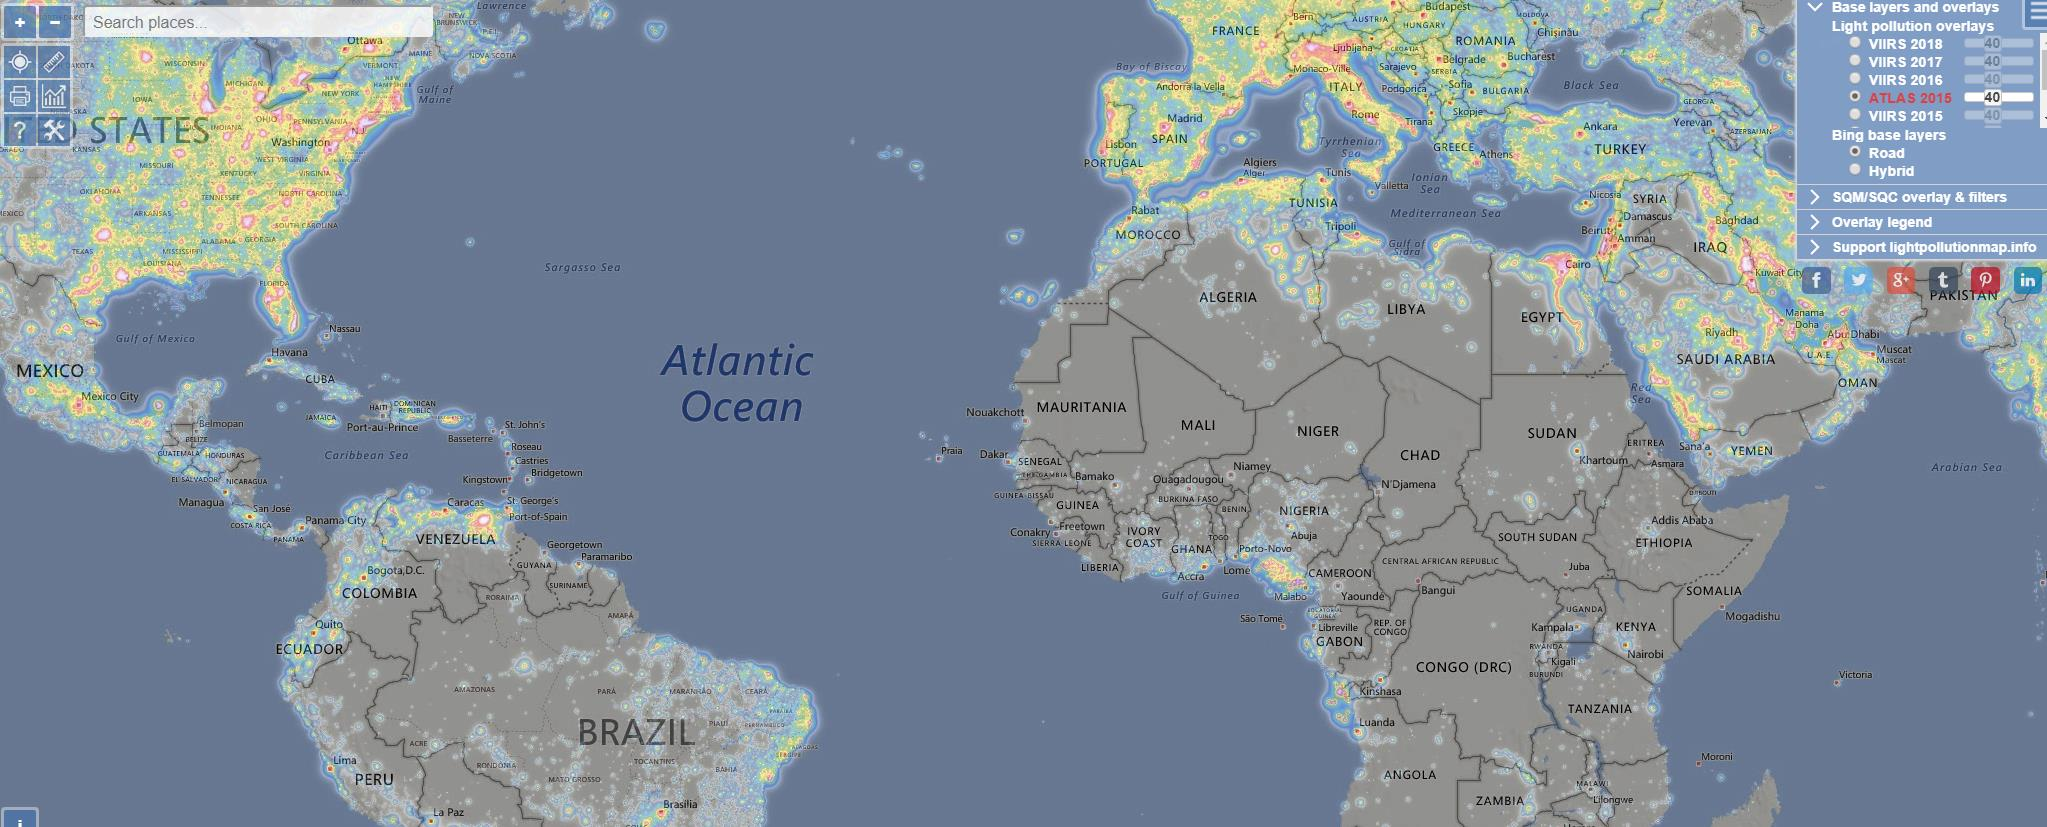 Un mapa interactivo de polución lumínica del mundo